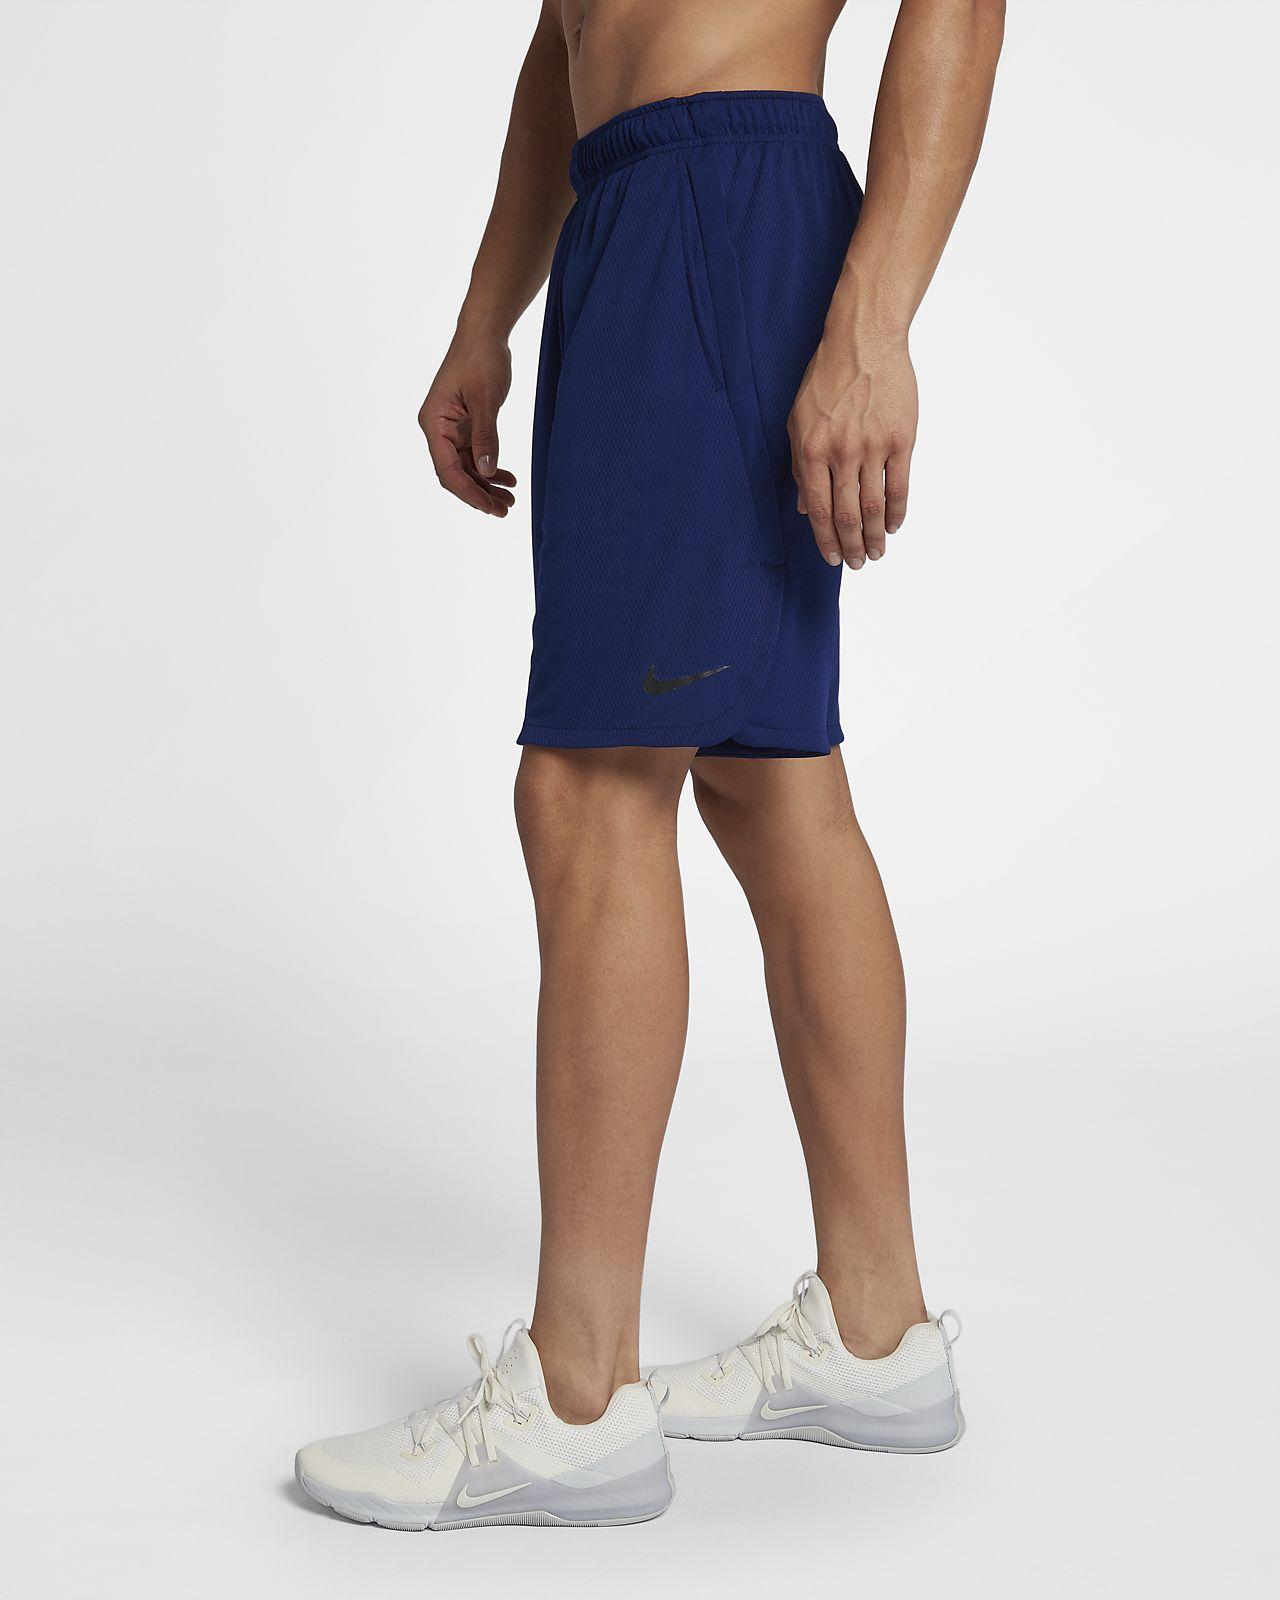 96b950a86f0e Nike Dri-FIT Men s Woven 9